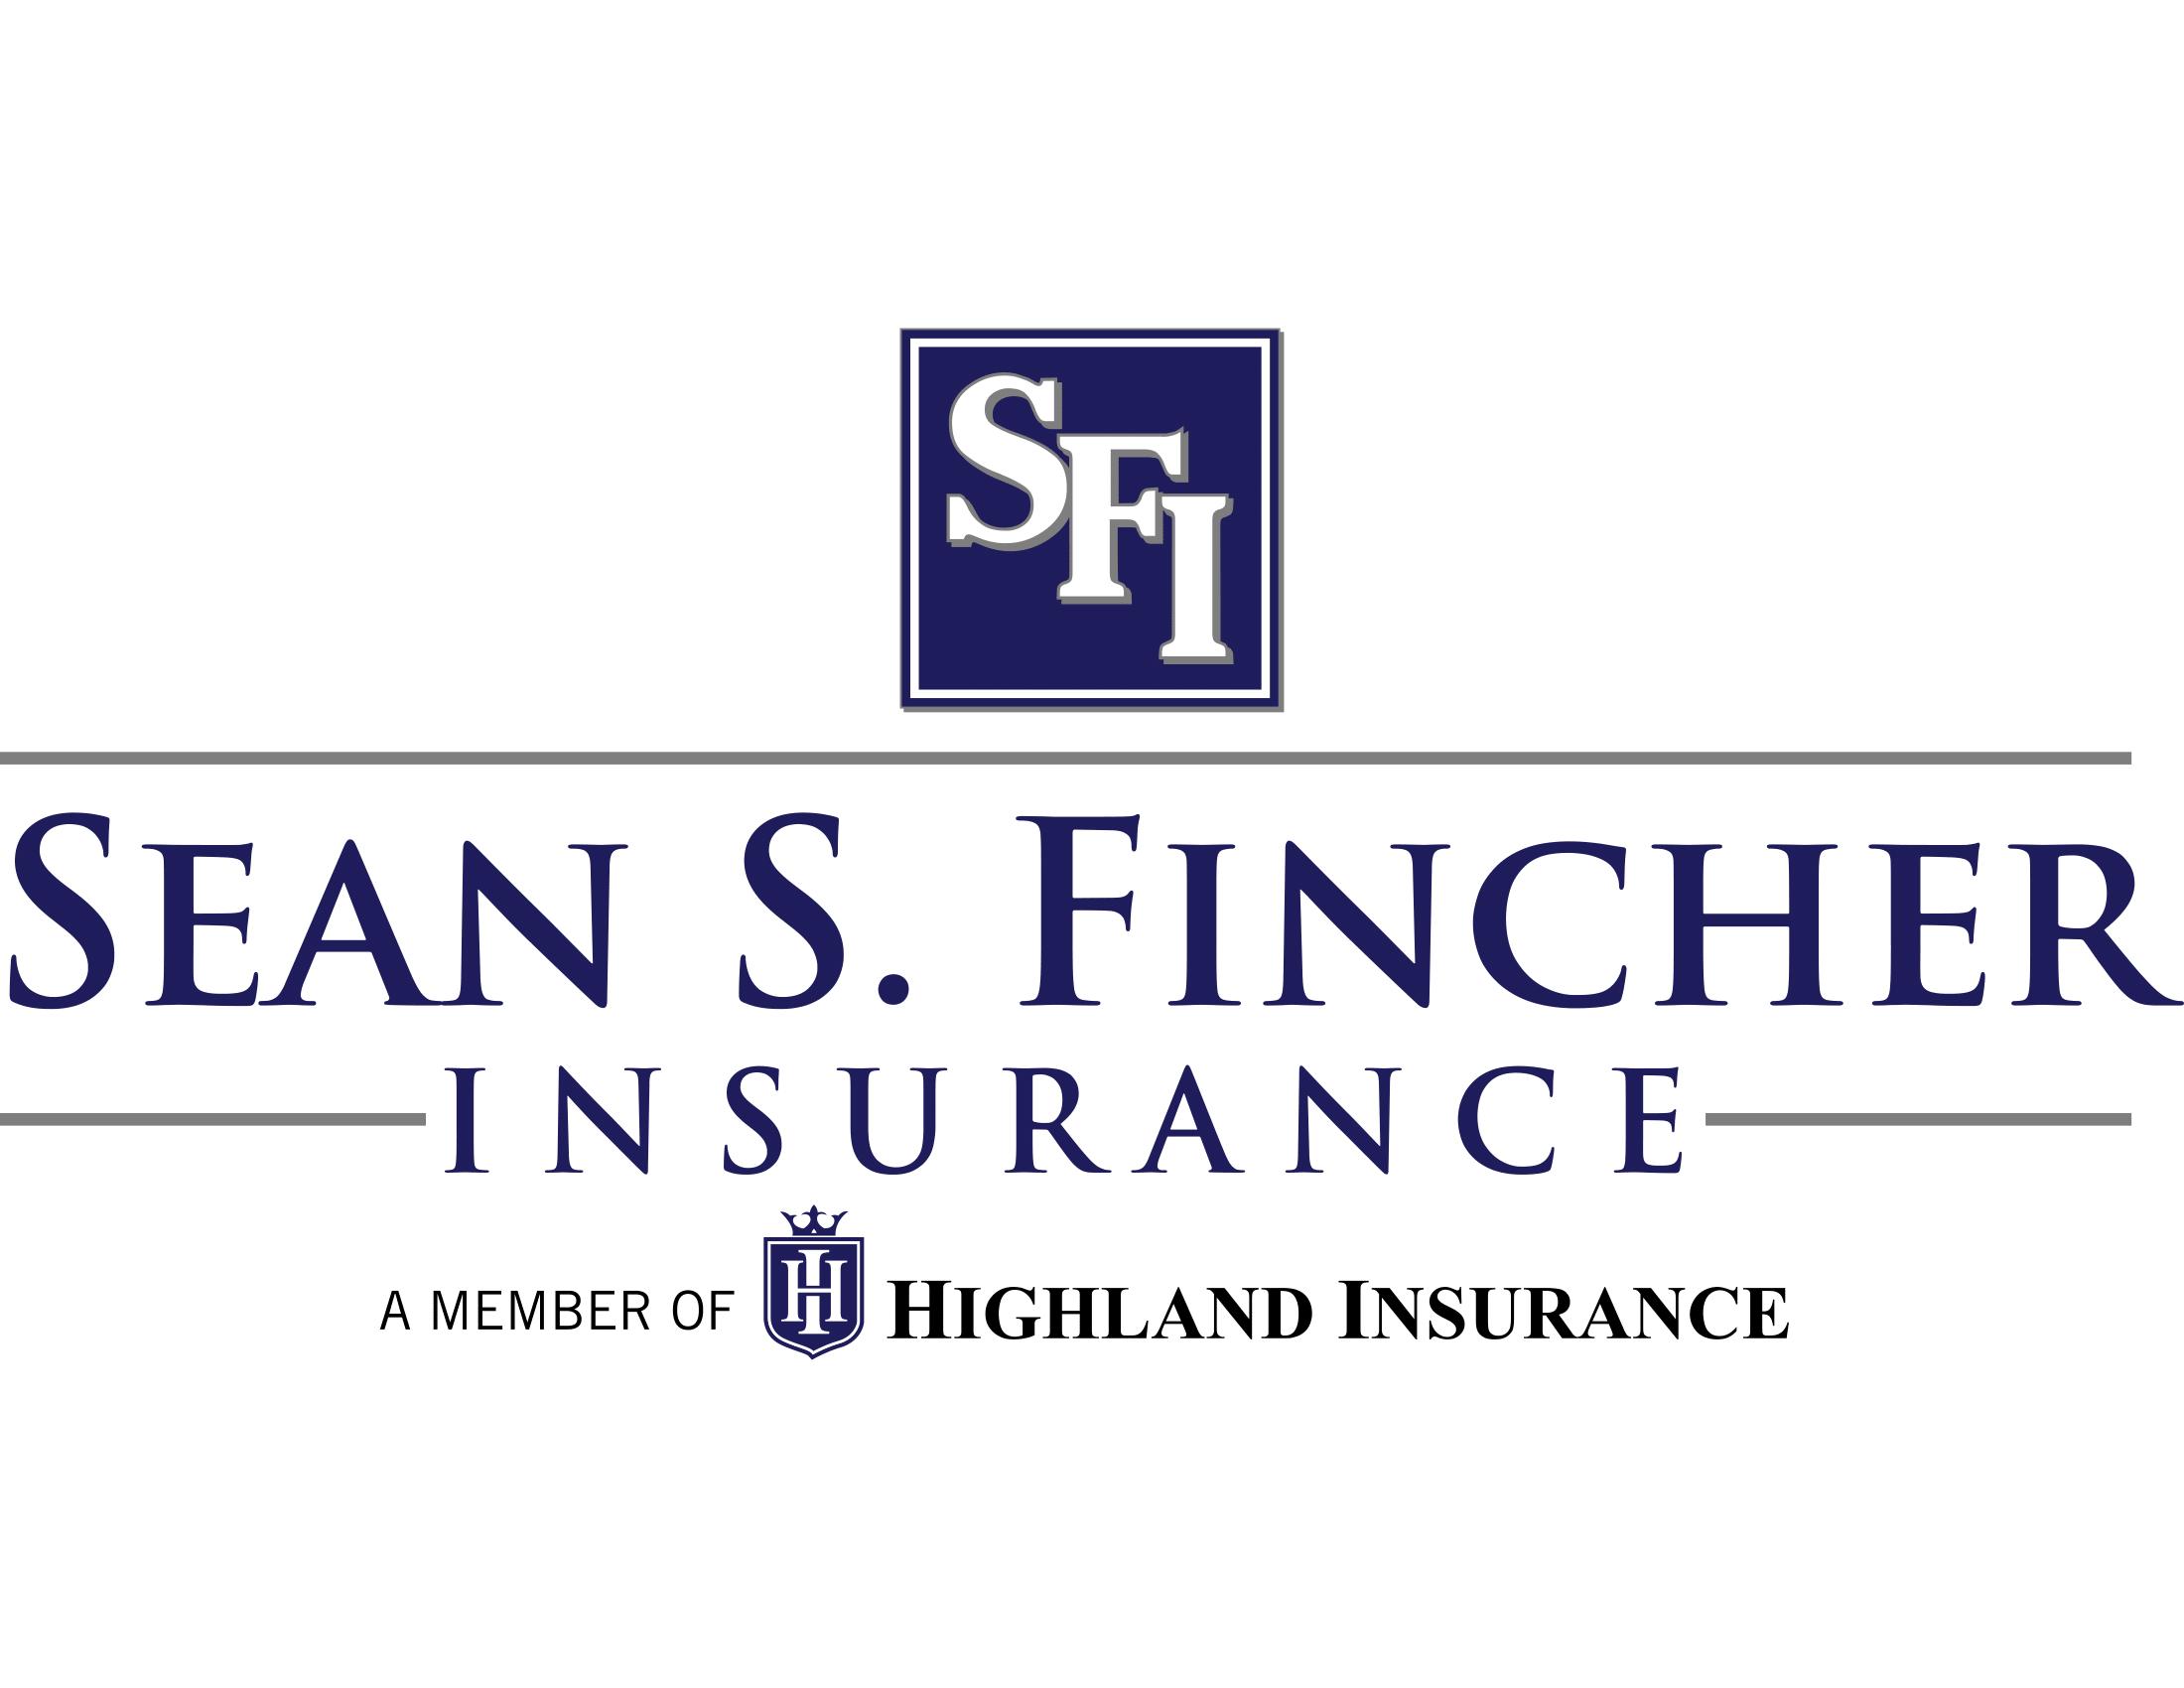 Sean fincher insurance